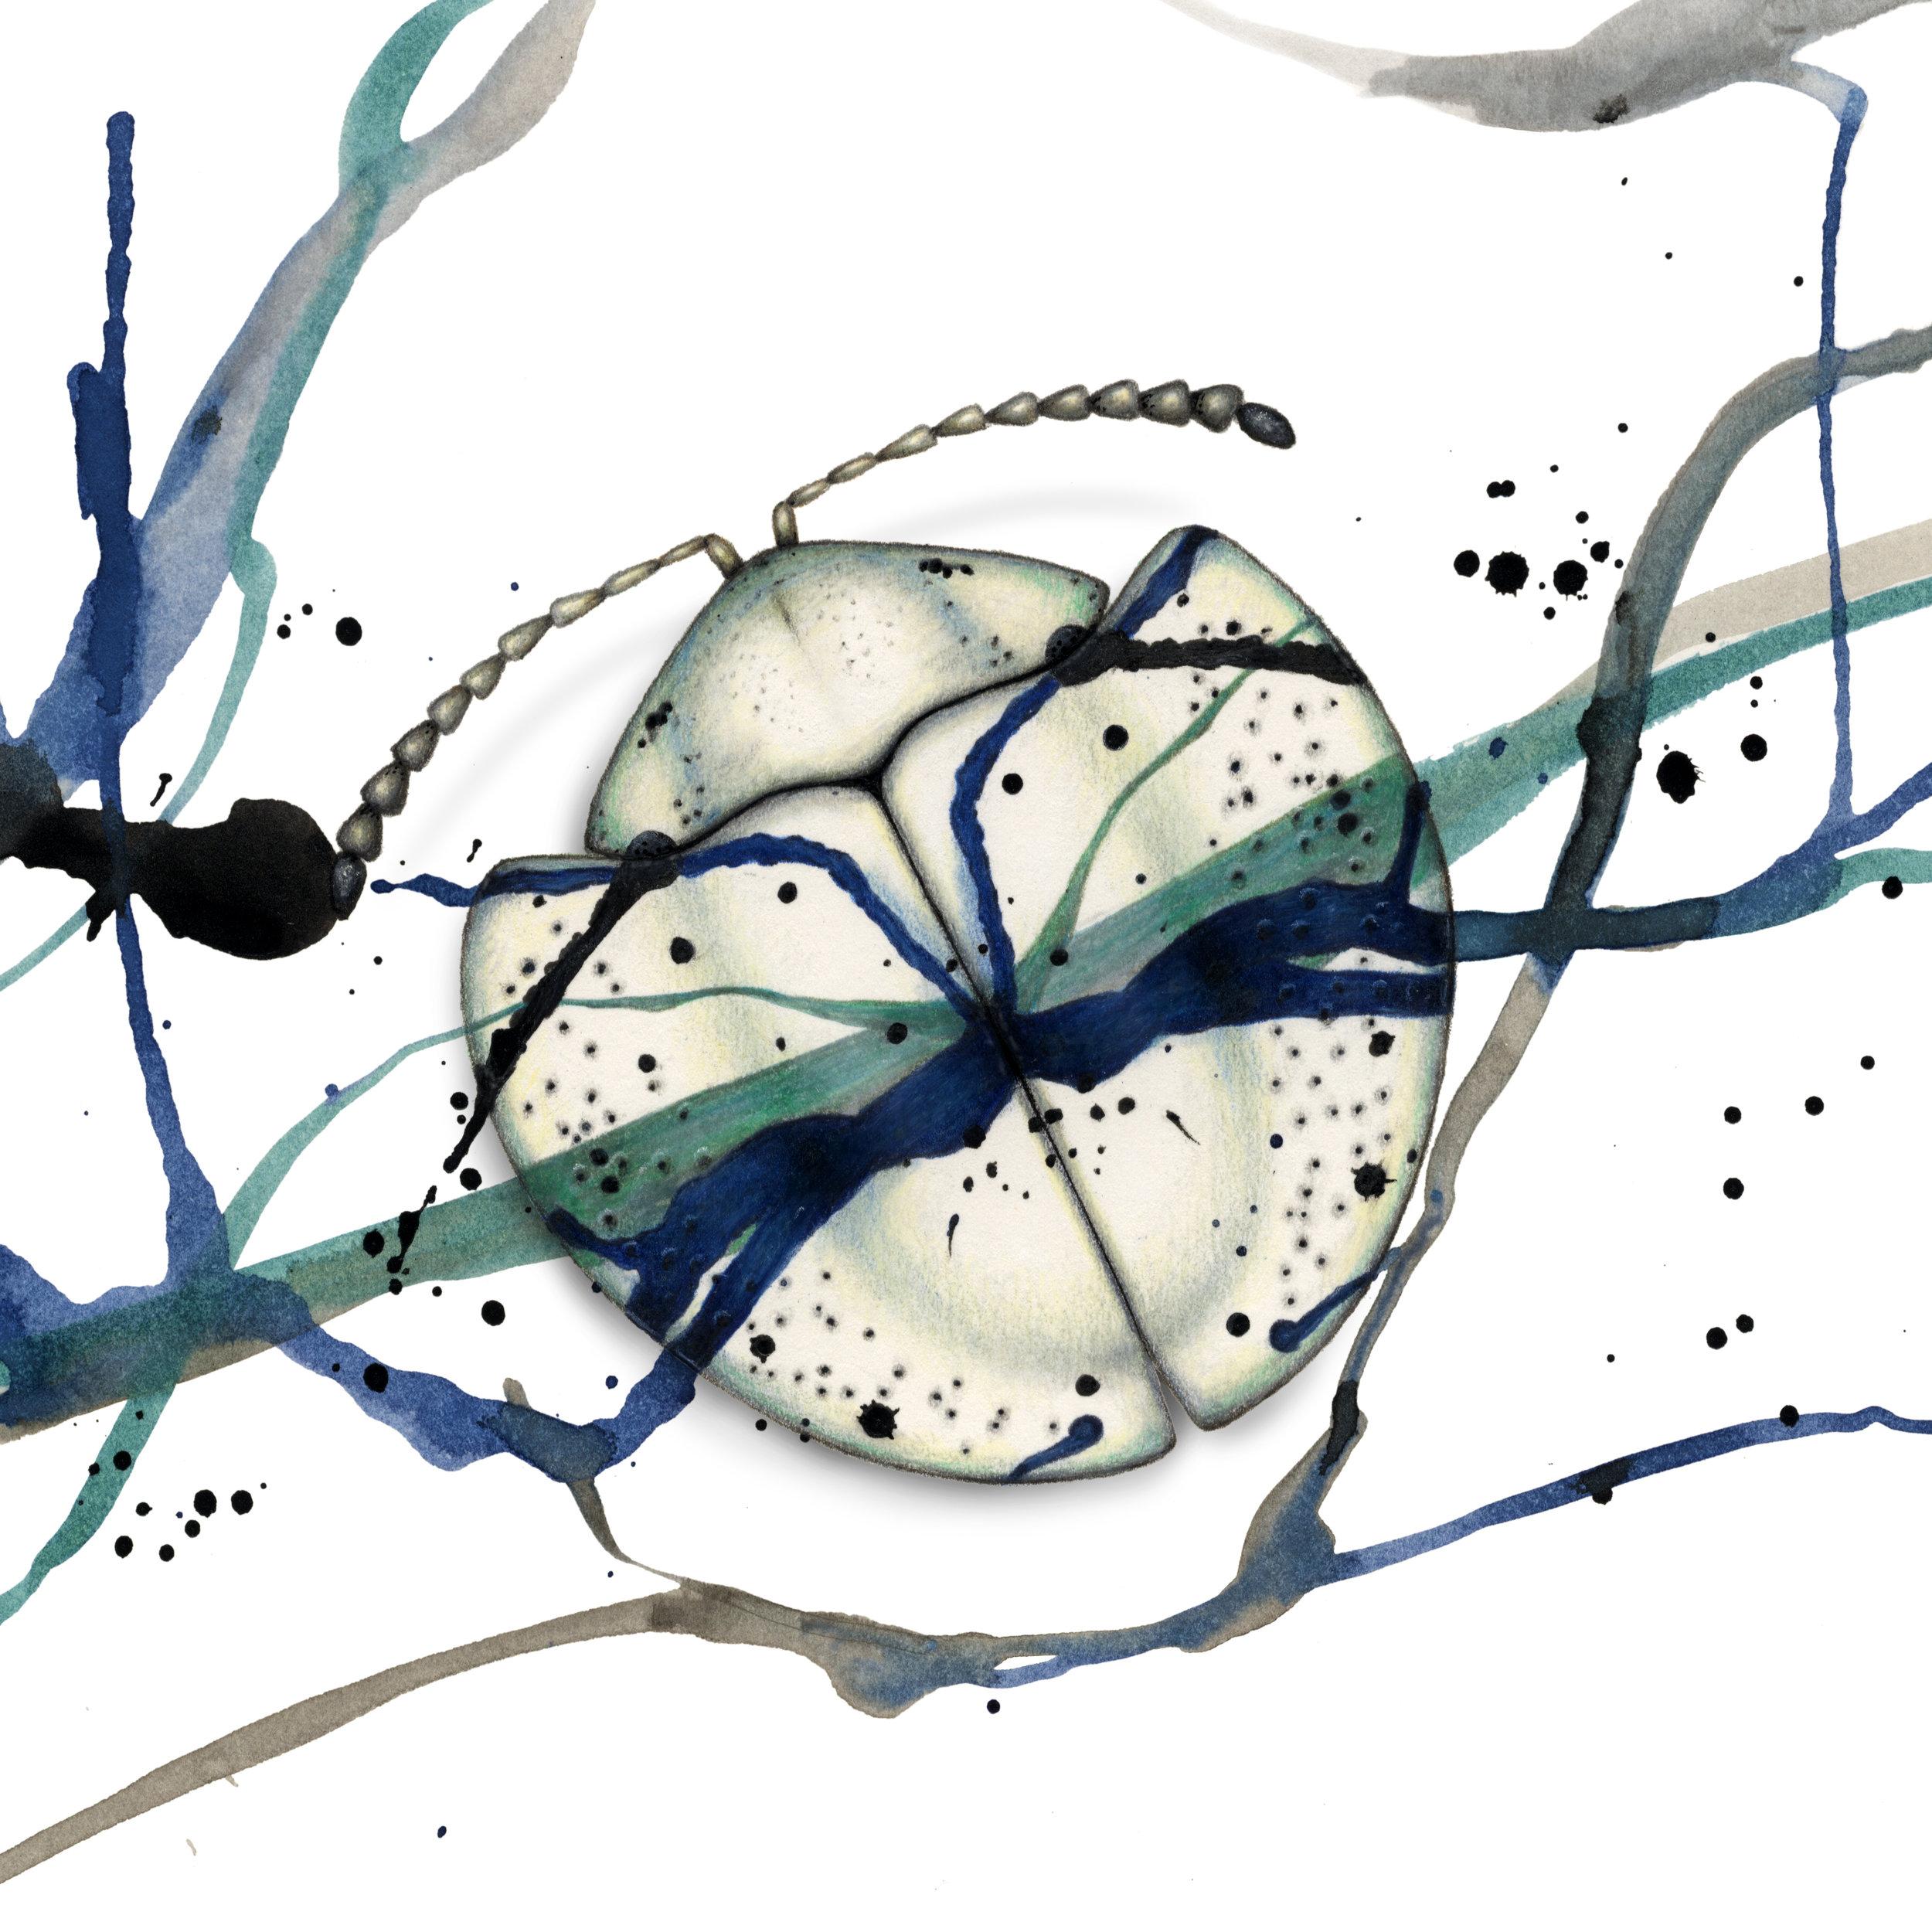 Studio-dwelling Coleoptera - beetles